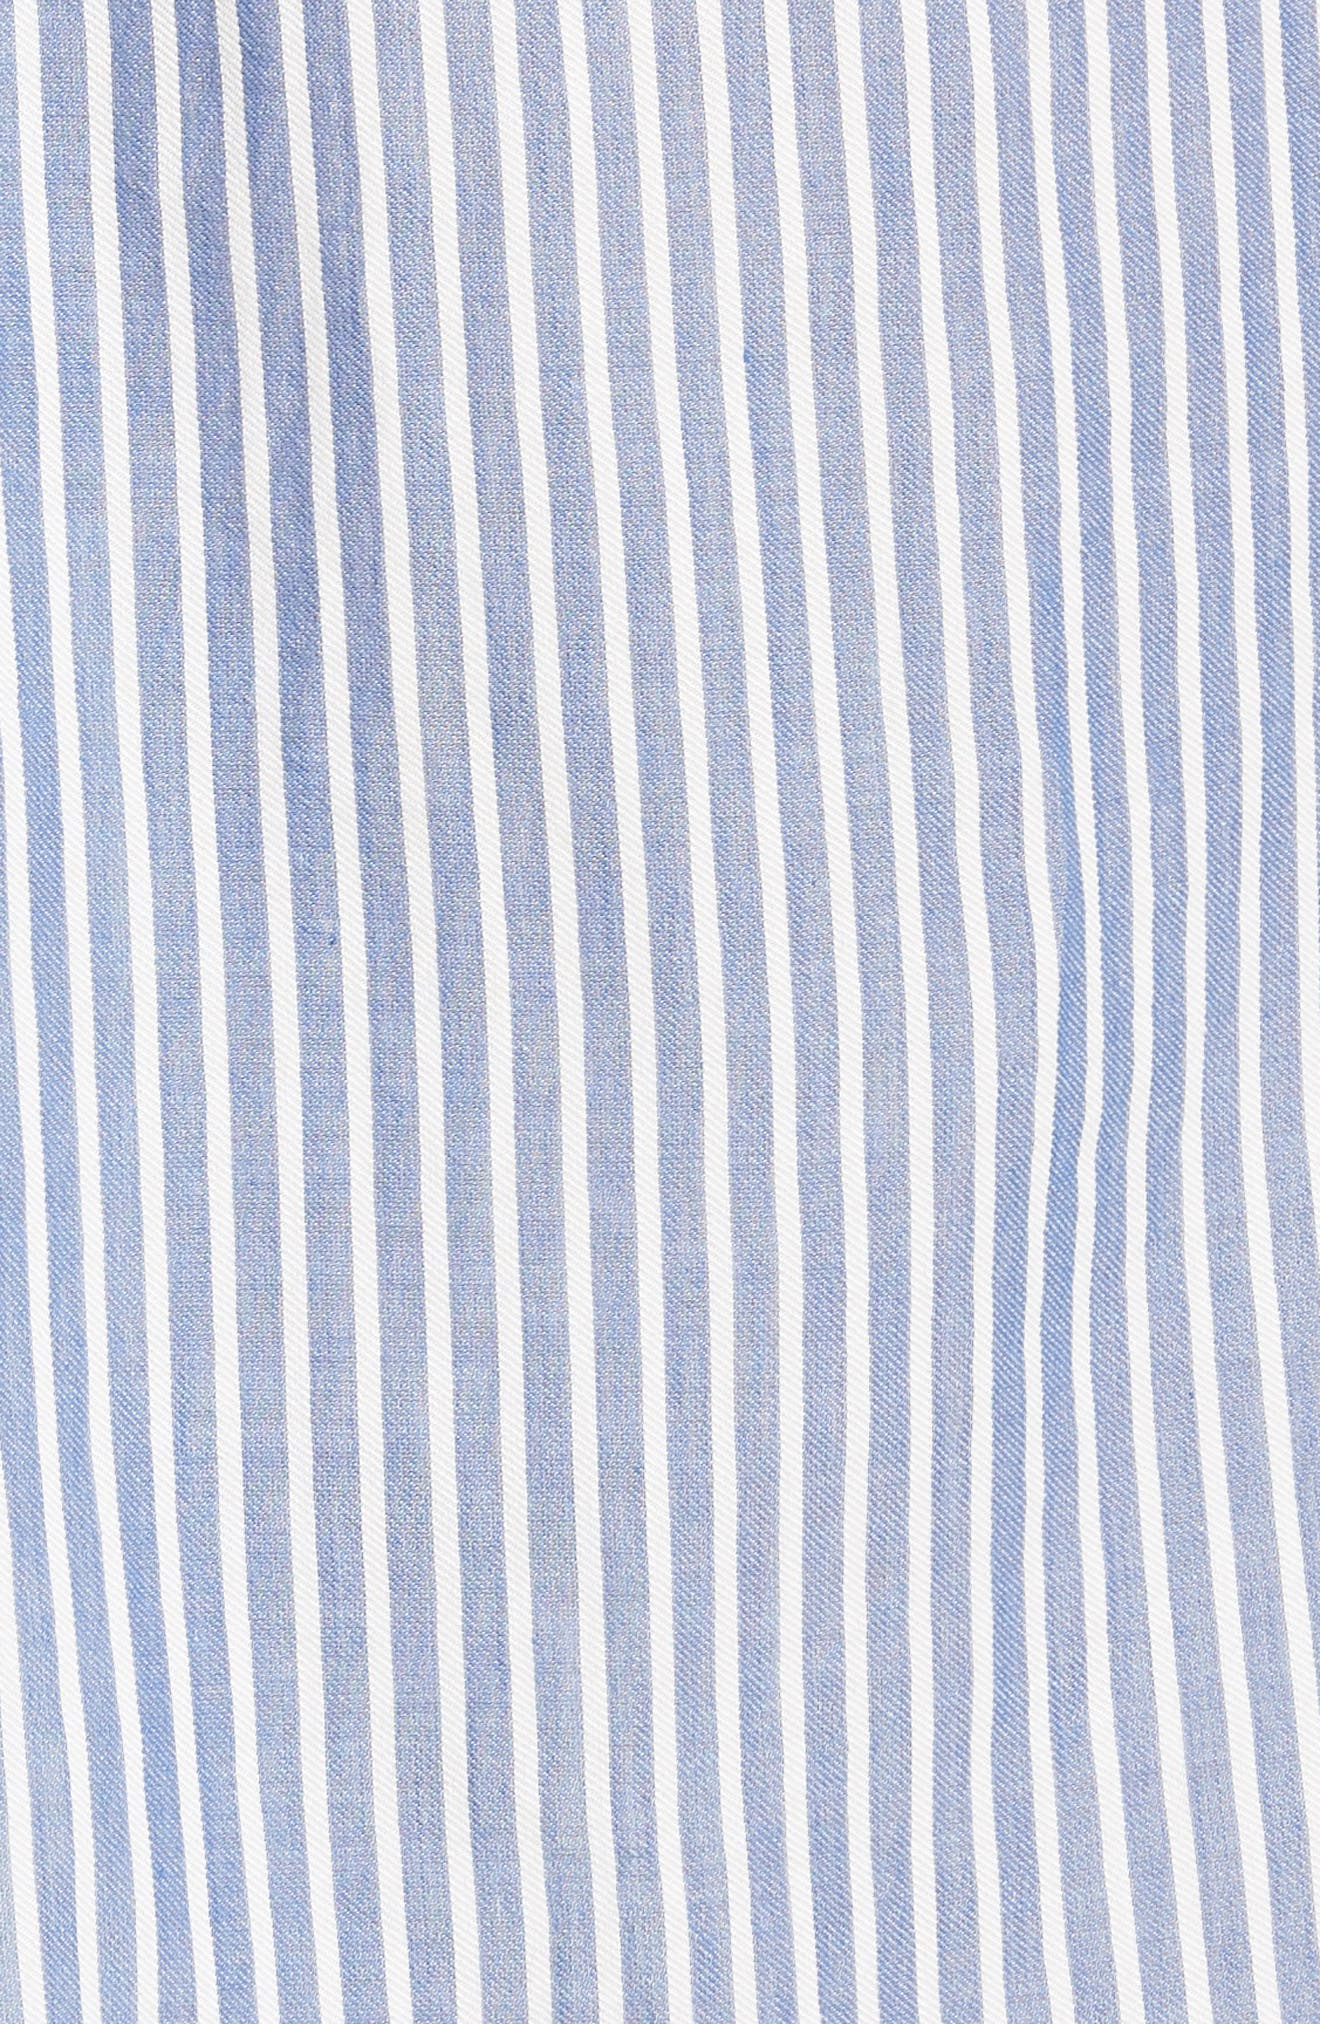 Classic Stripe Twist Cotton Blend Shirtdress,                             Alternate thumbnail 5, color,                             White/ Blue